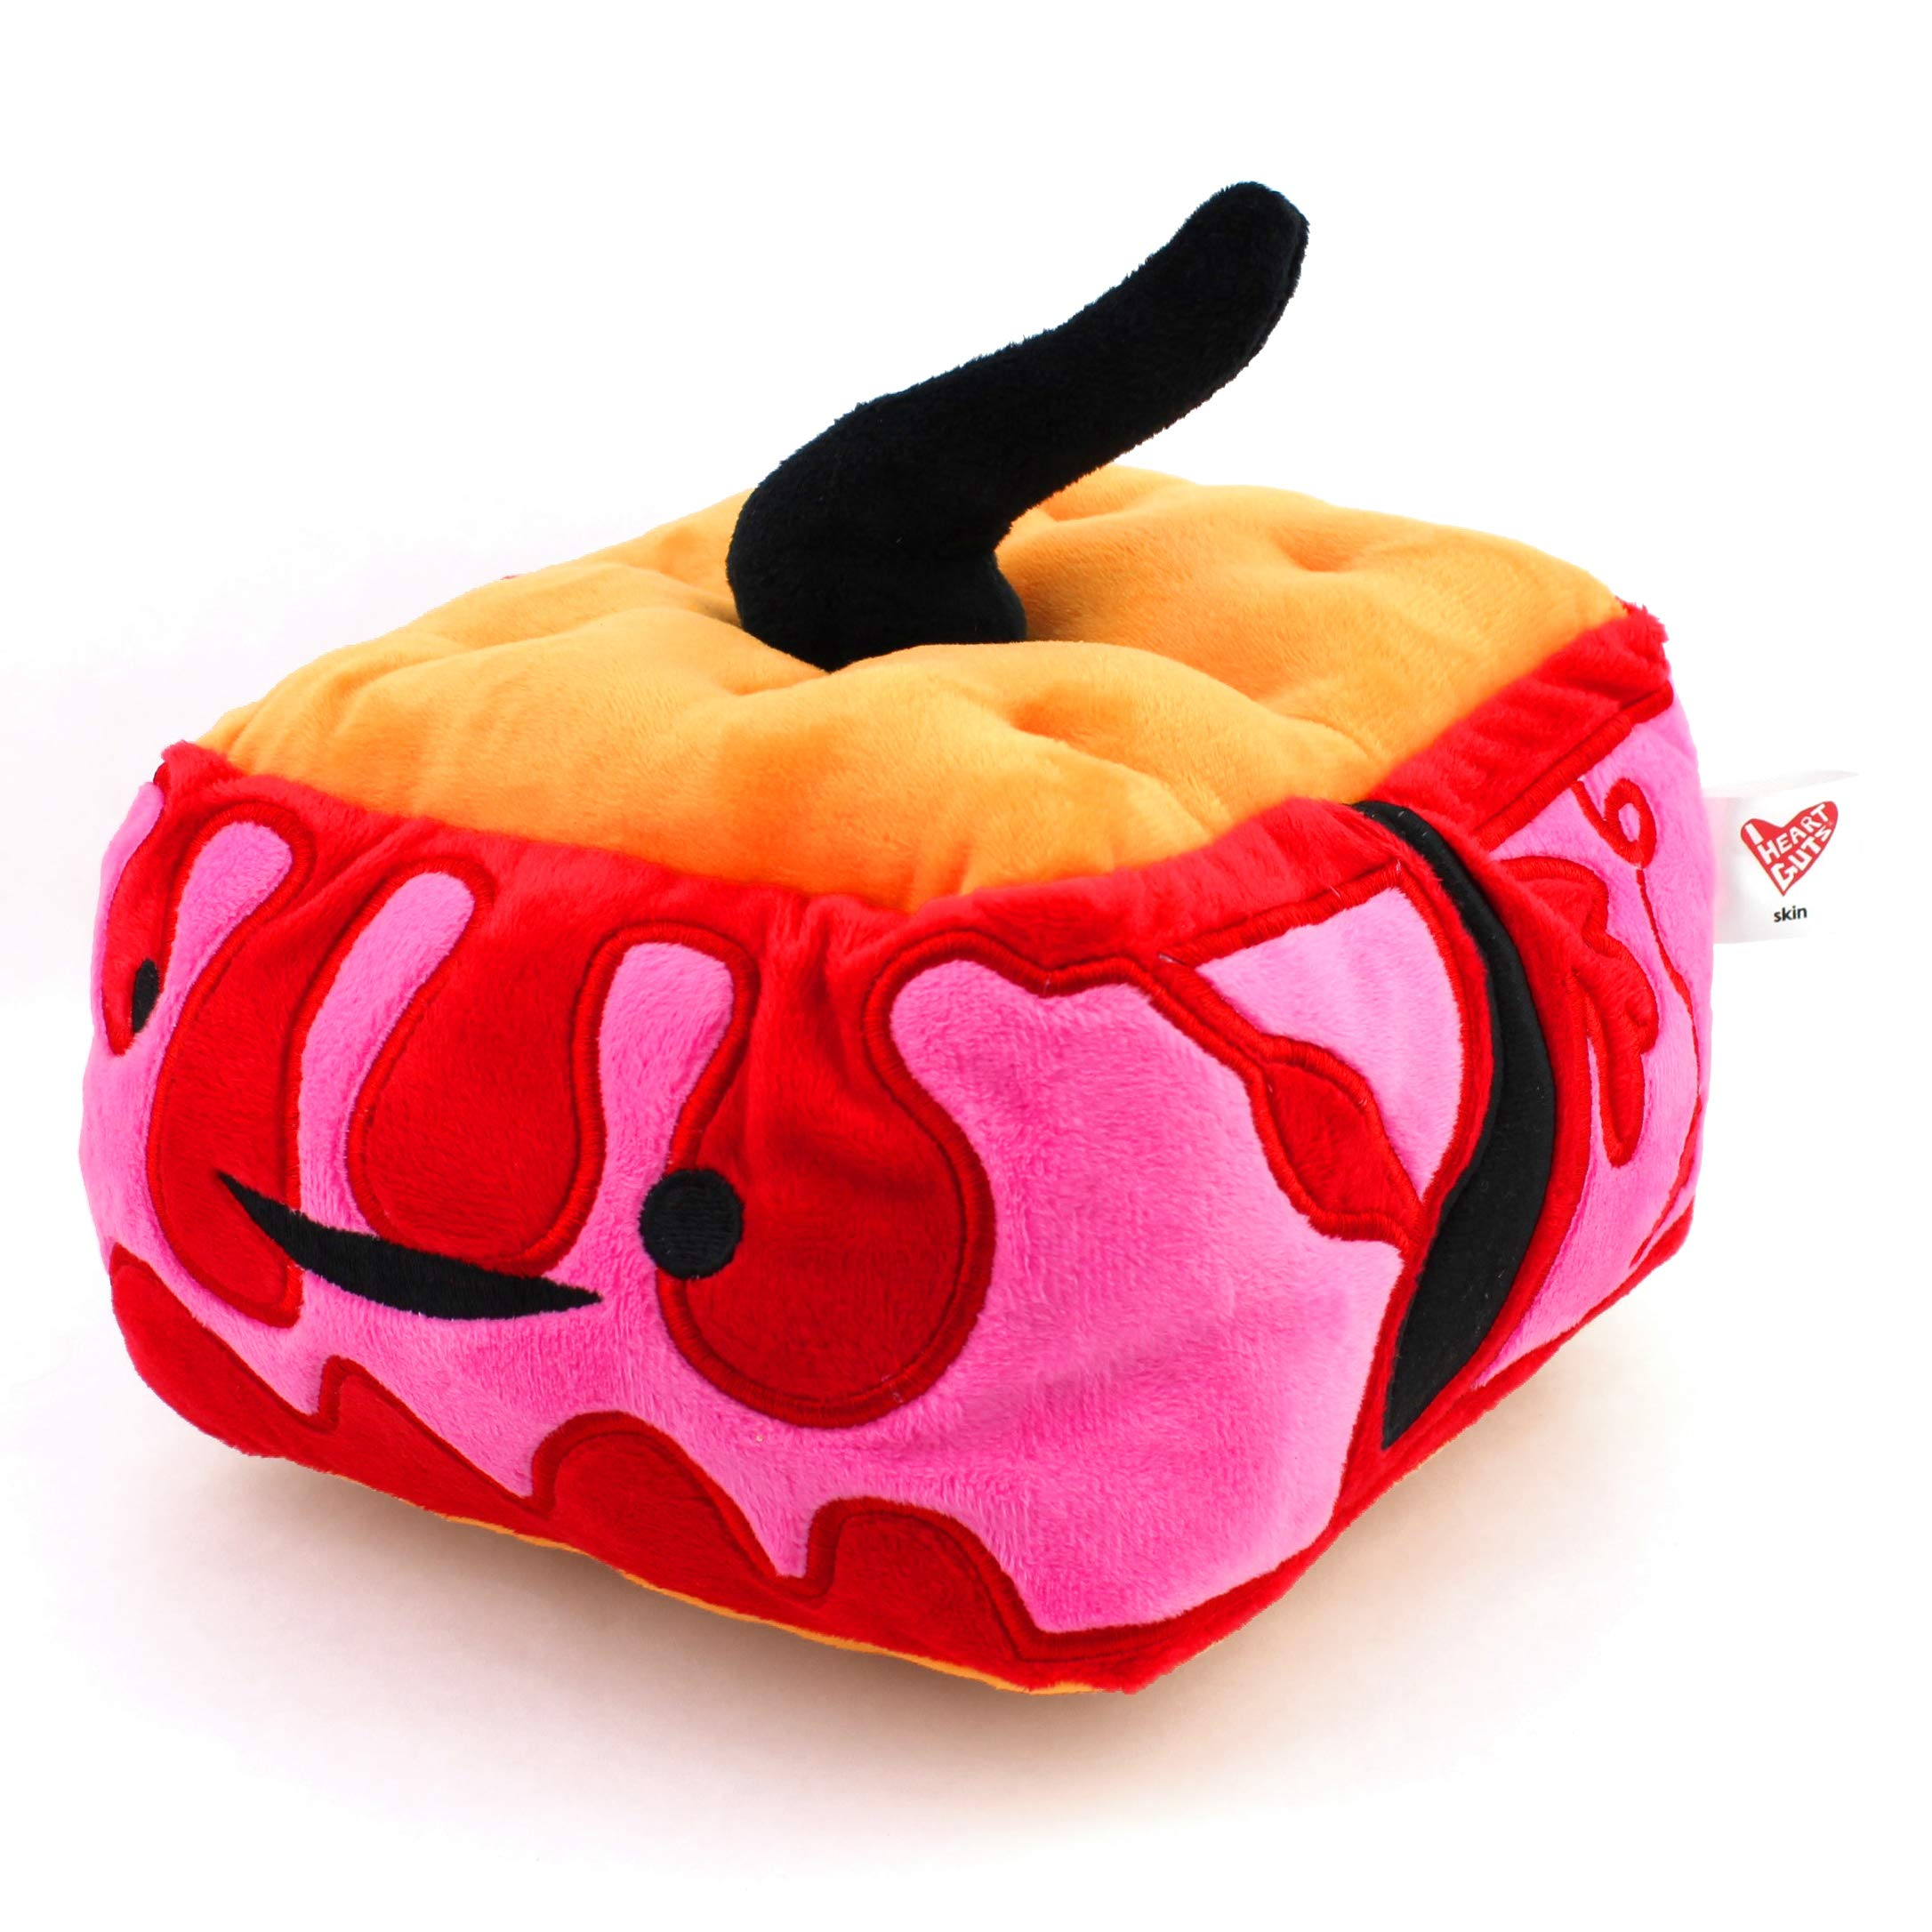 Amazon Com I Heart Guts Skin Plush In The Flesh 9 Dermatology Gift Stuffed Toy Plushie Toys Games